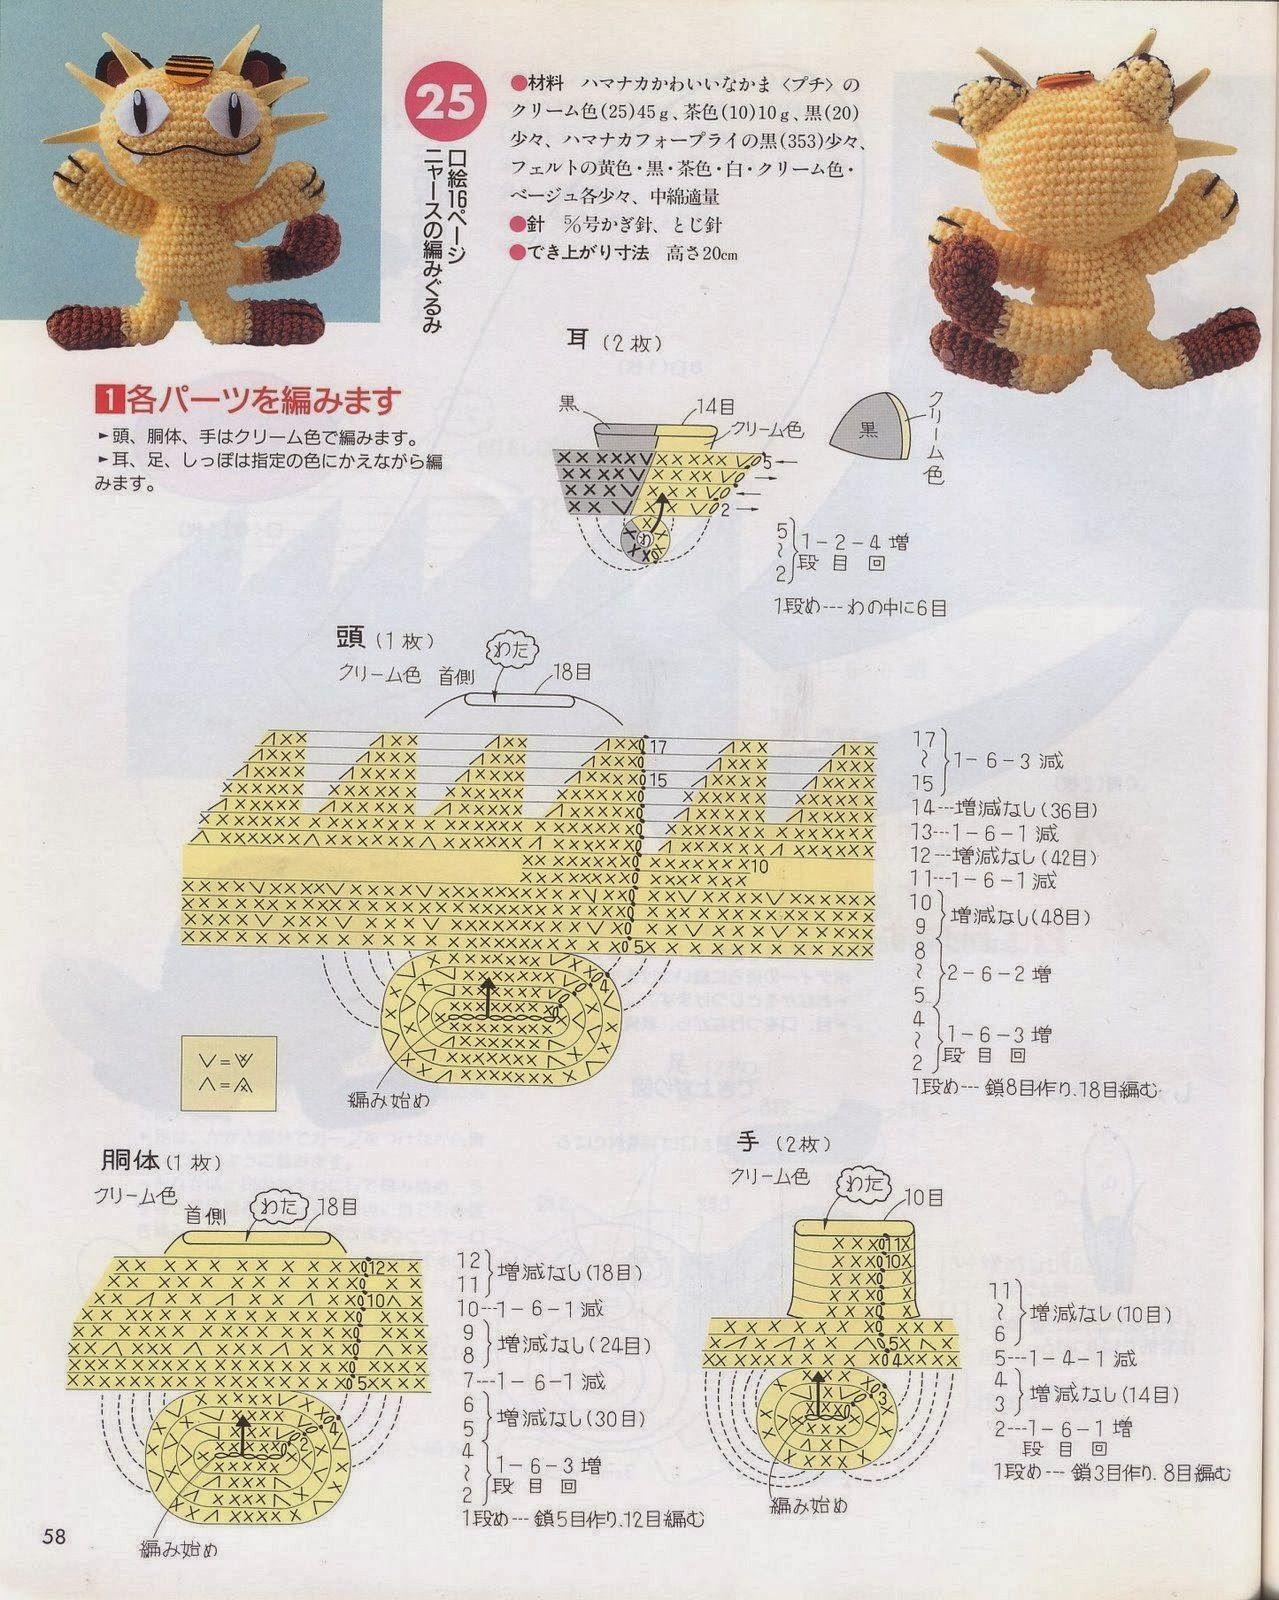 Blog de Goanna: Muñecos Pokemon en Amigurumi | Amirugumi | Pinterest ...